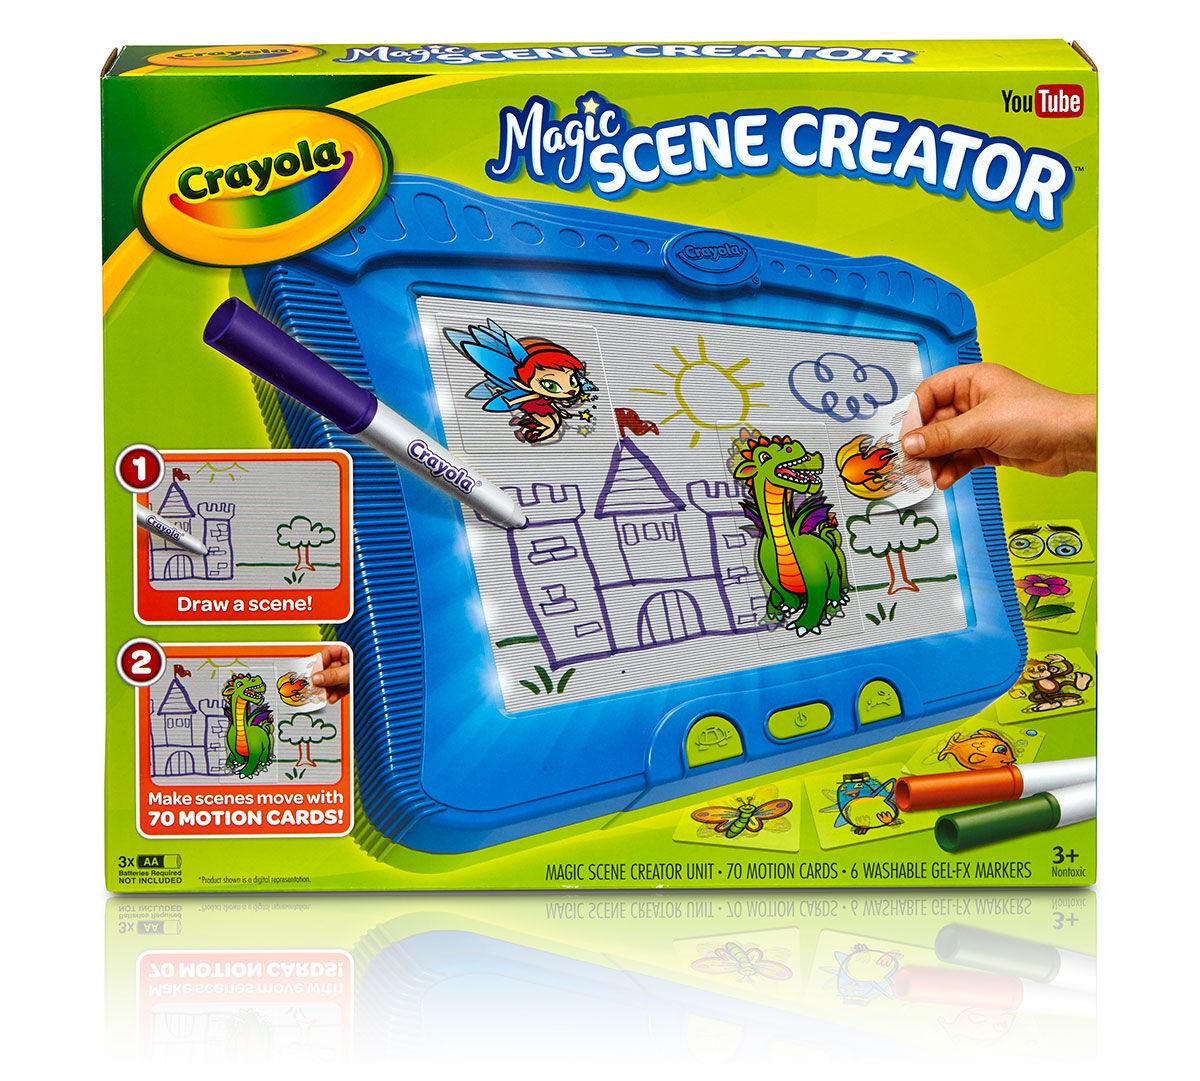 Crayola Magic Scene Creator, Creative Activity Toy, Turn Pictures ...